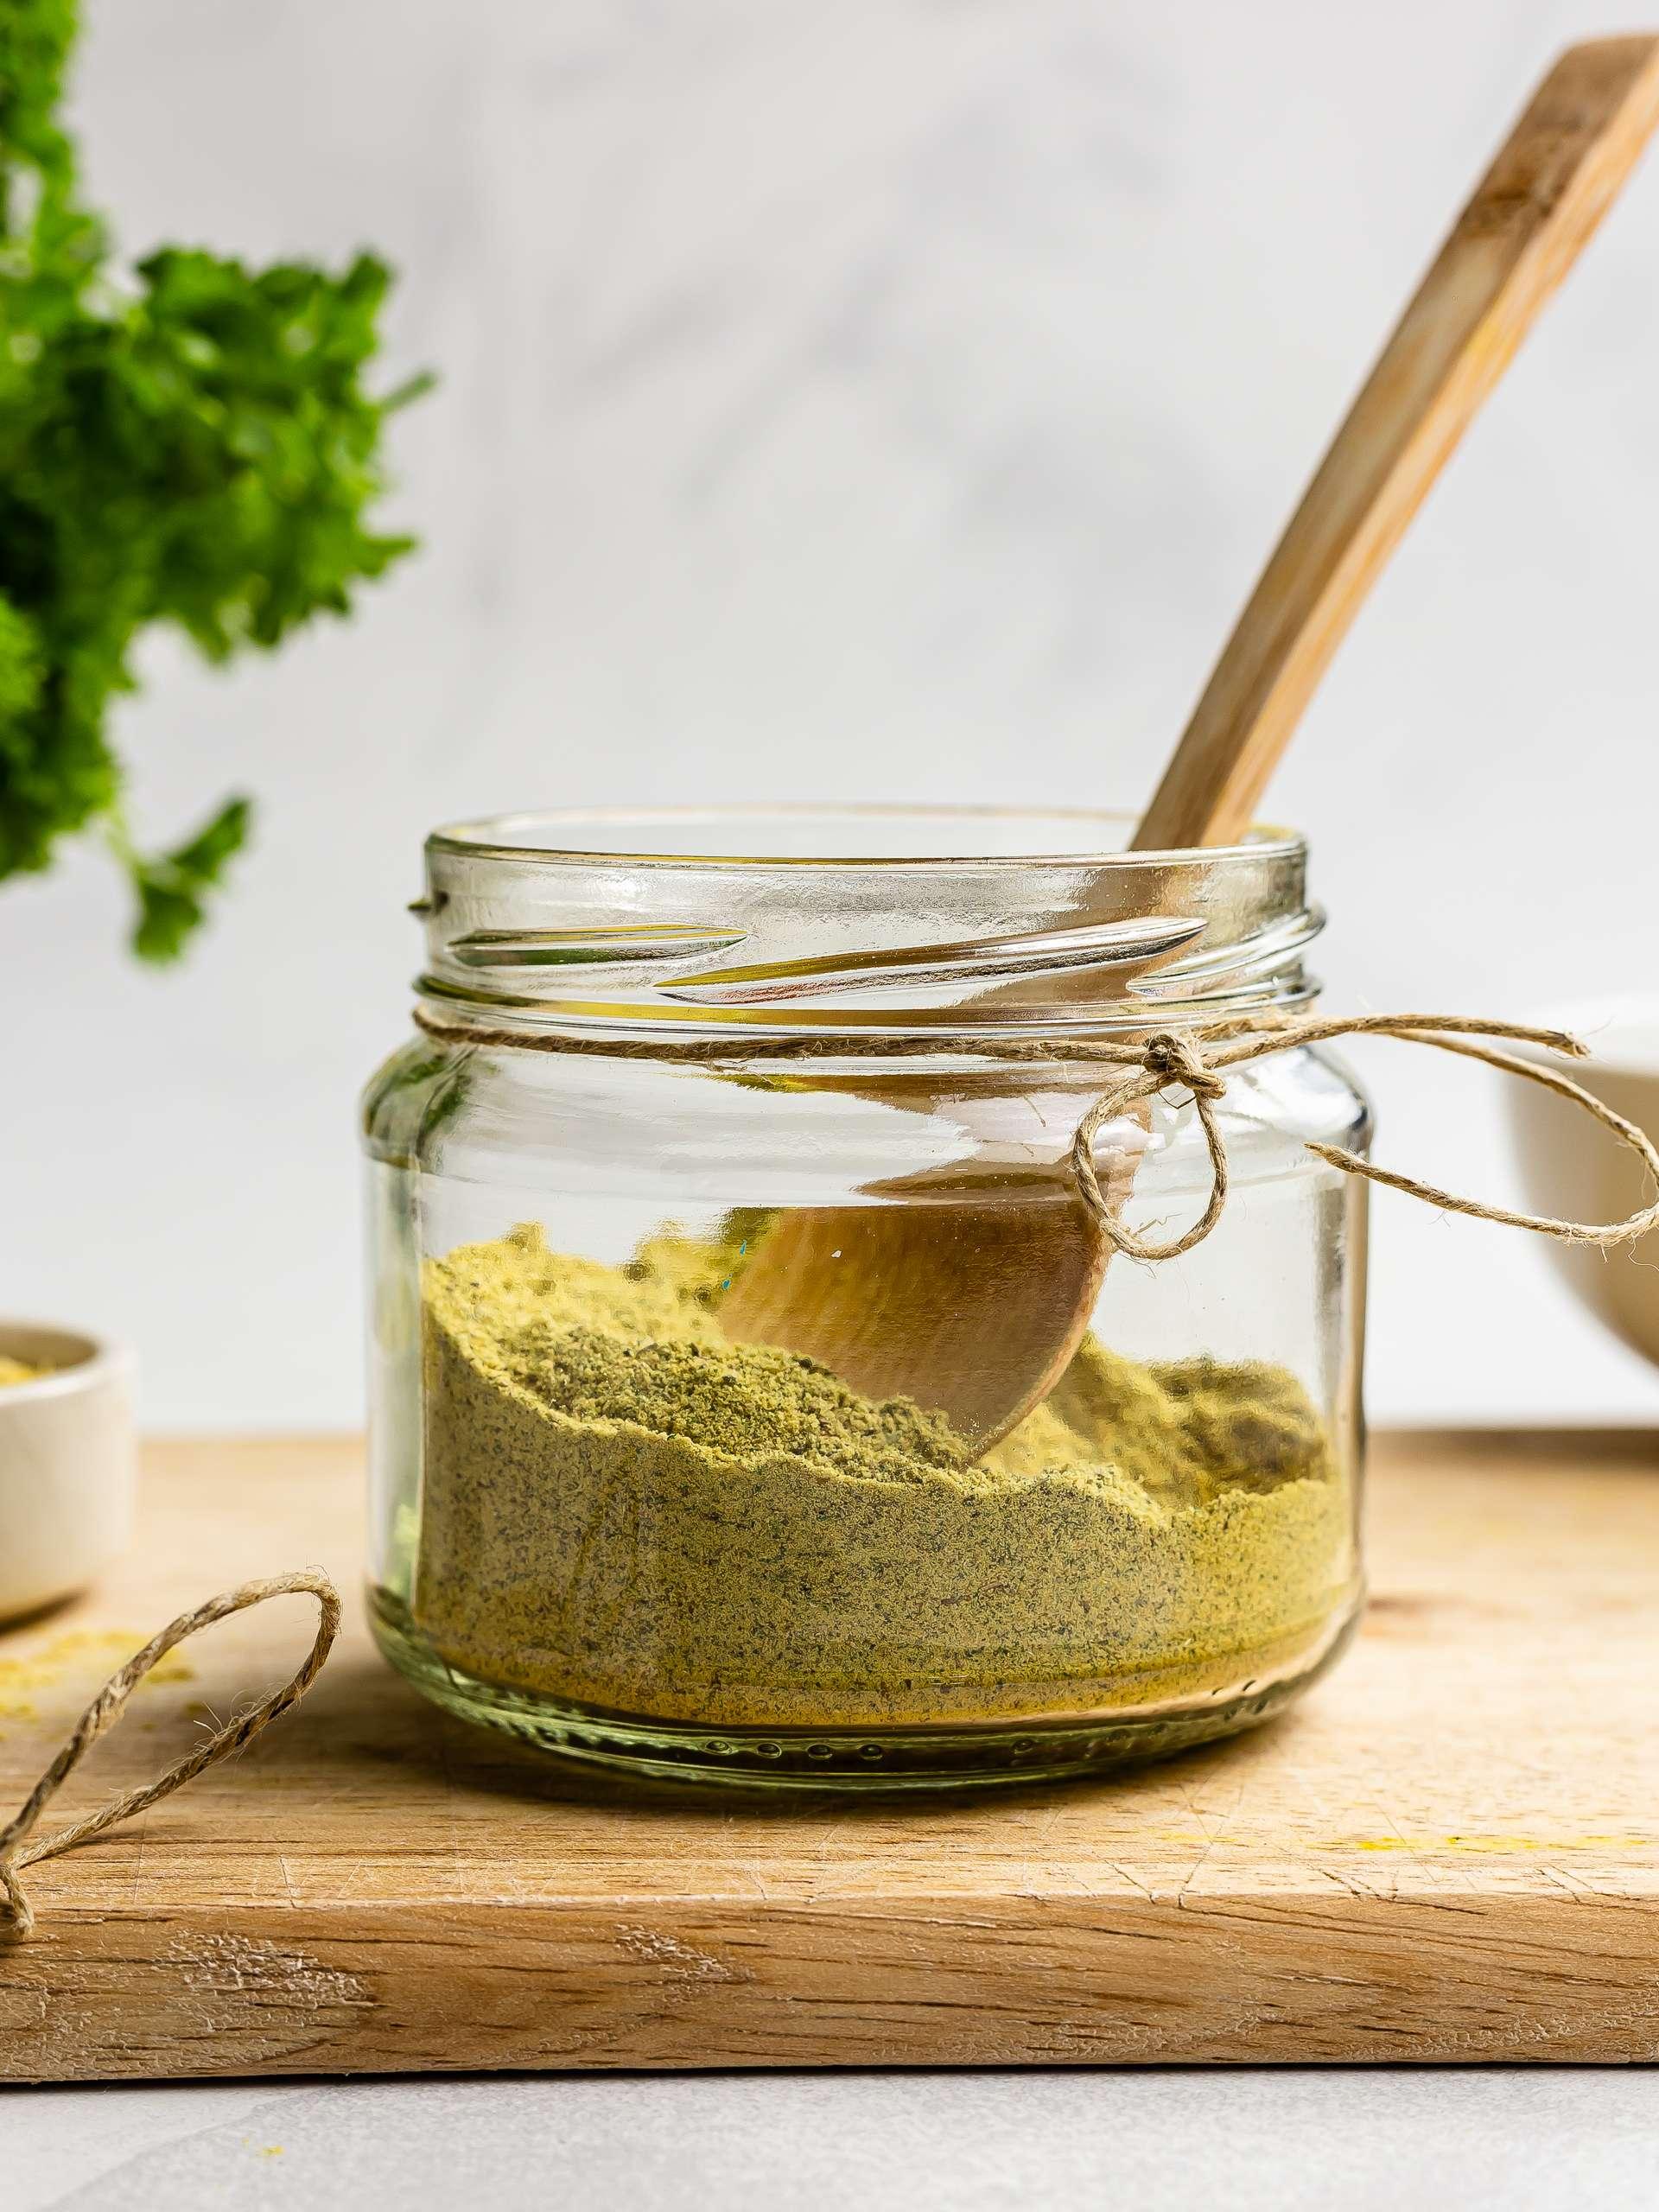 Vegan Bouillon Powder (Salt-Free)